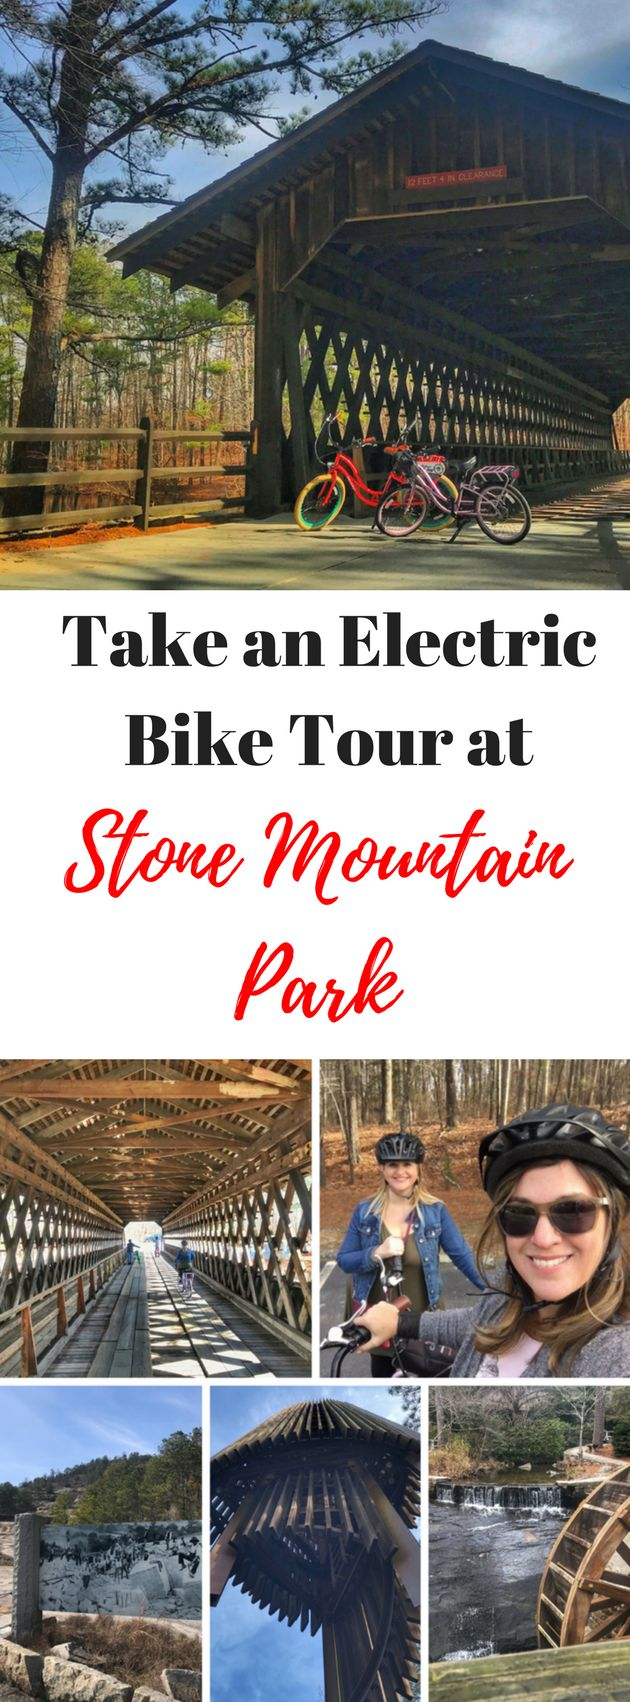 See hidden gems in Stone Mountain Park in Atlanta's DeKalb County on an electric bike tour. Georgia, United States